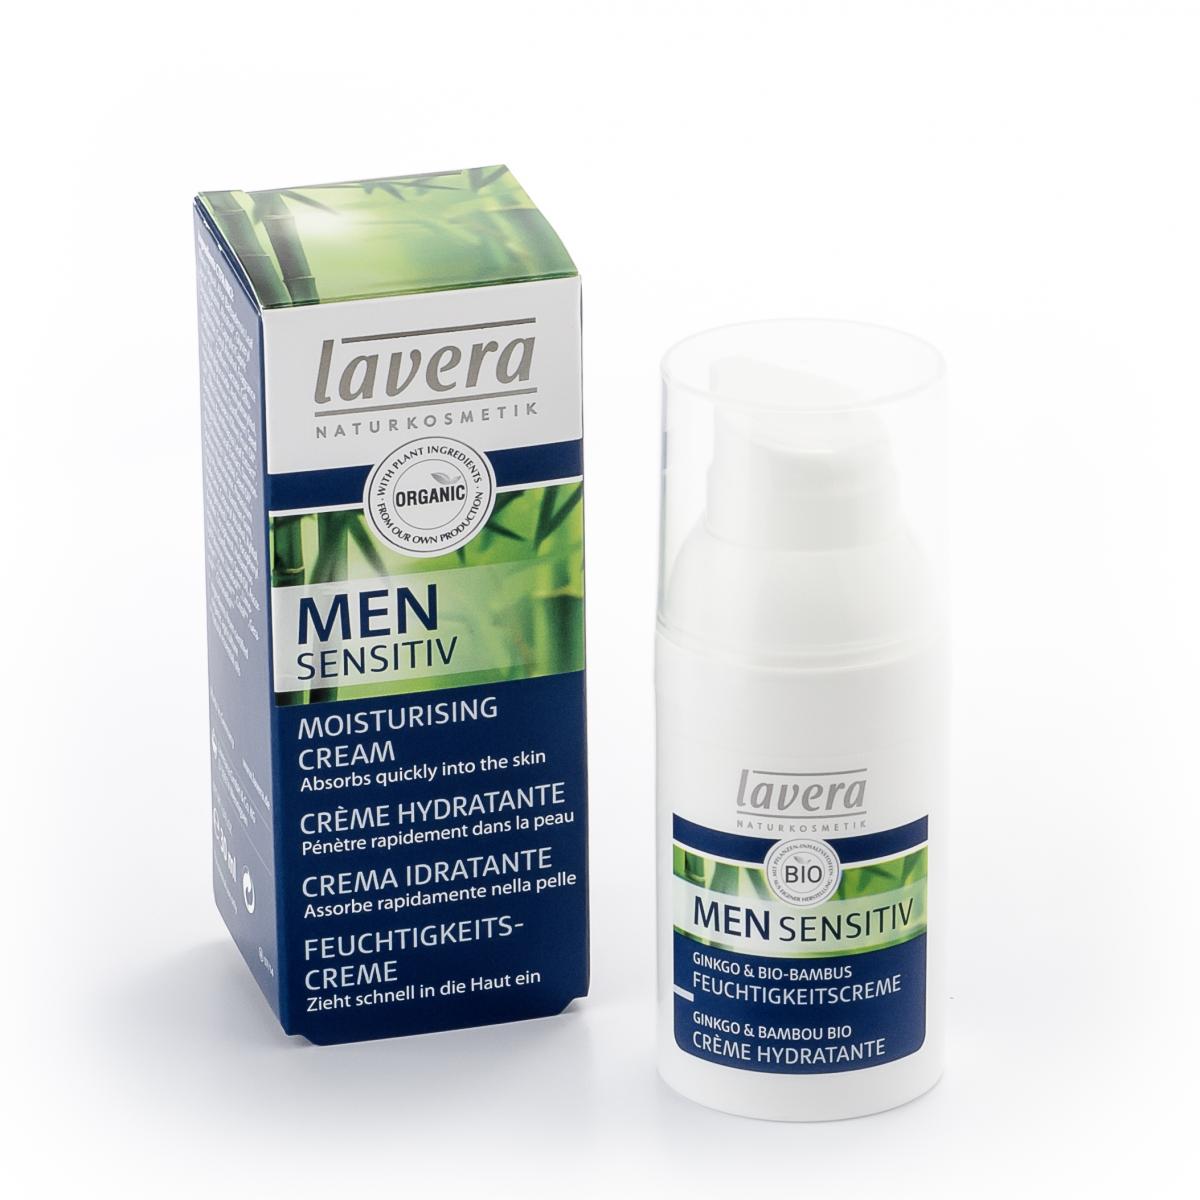 Feuchtigkeitscreme Men sensitiv